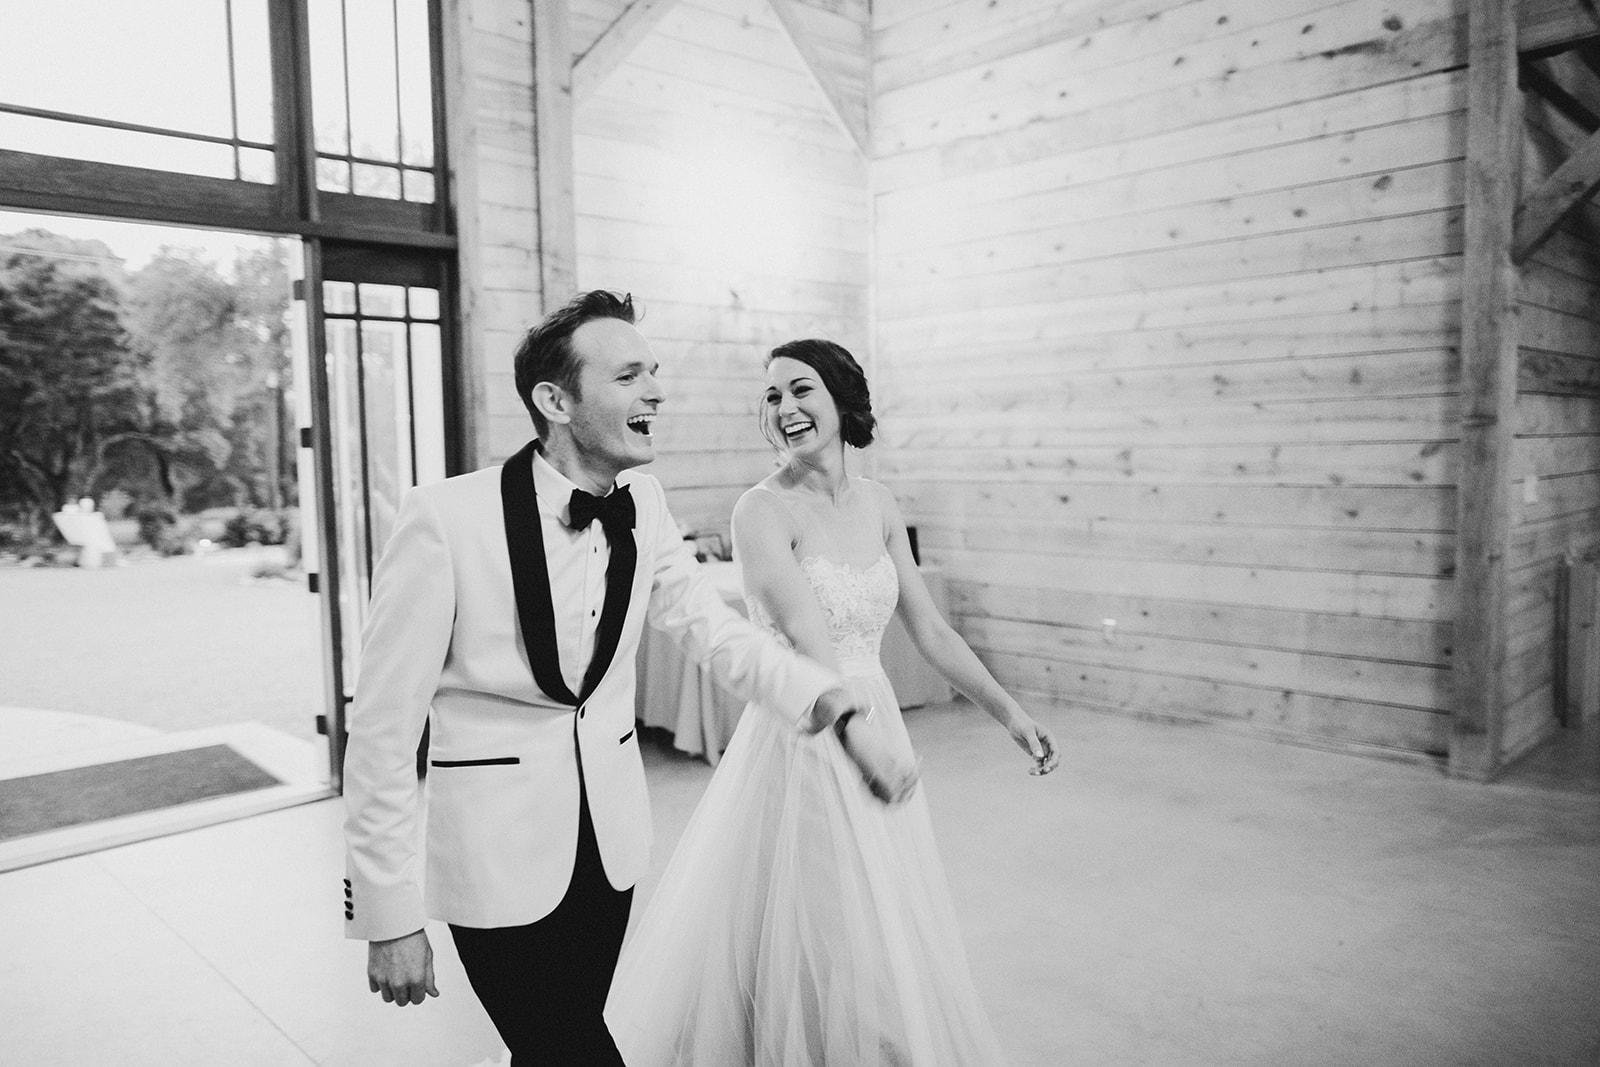 austin-wedding-lindsey-bryce-717.jpg